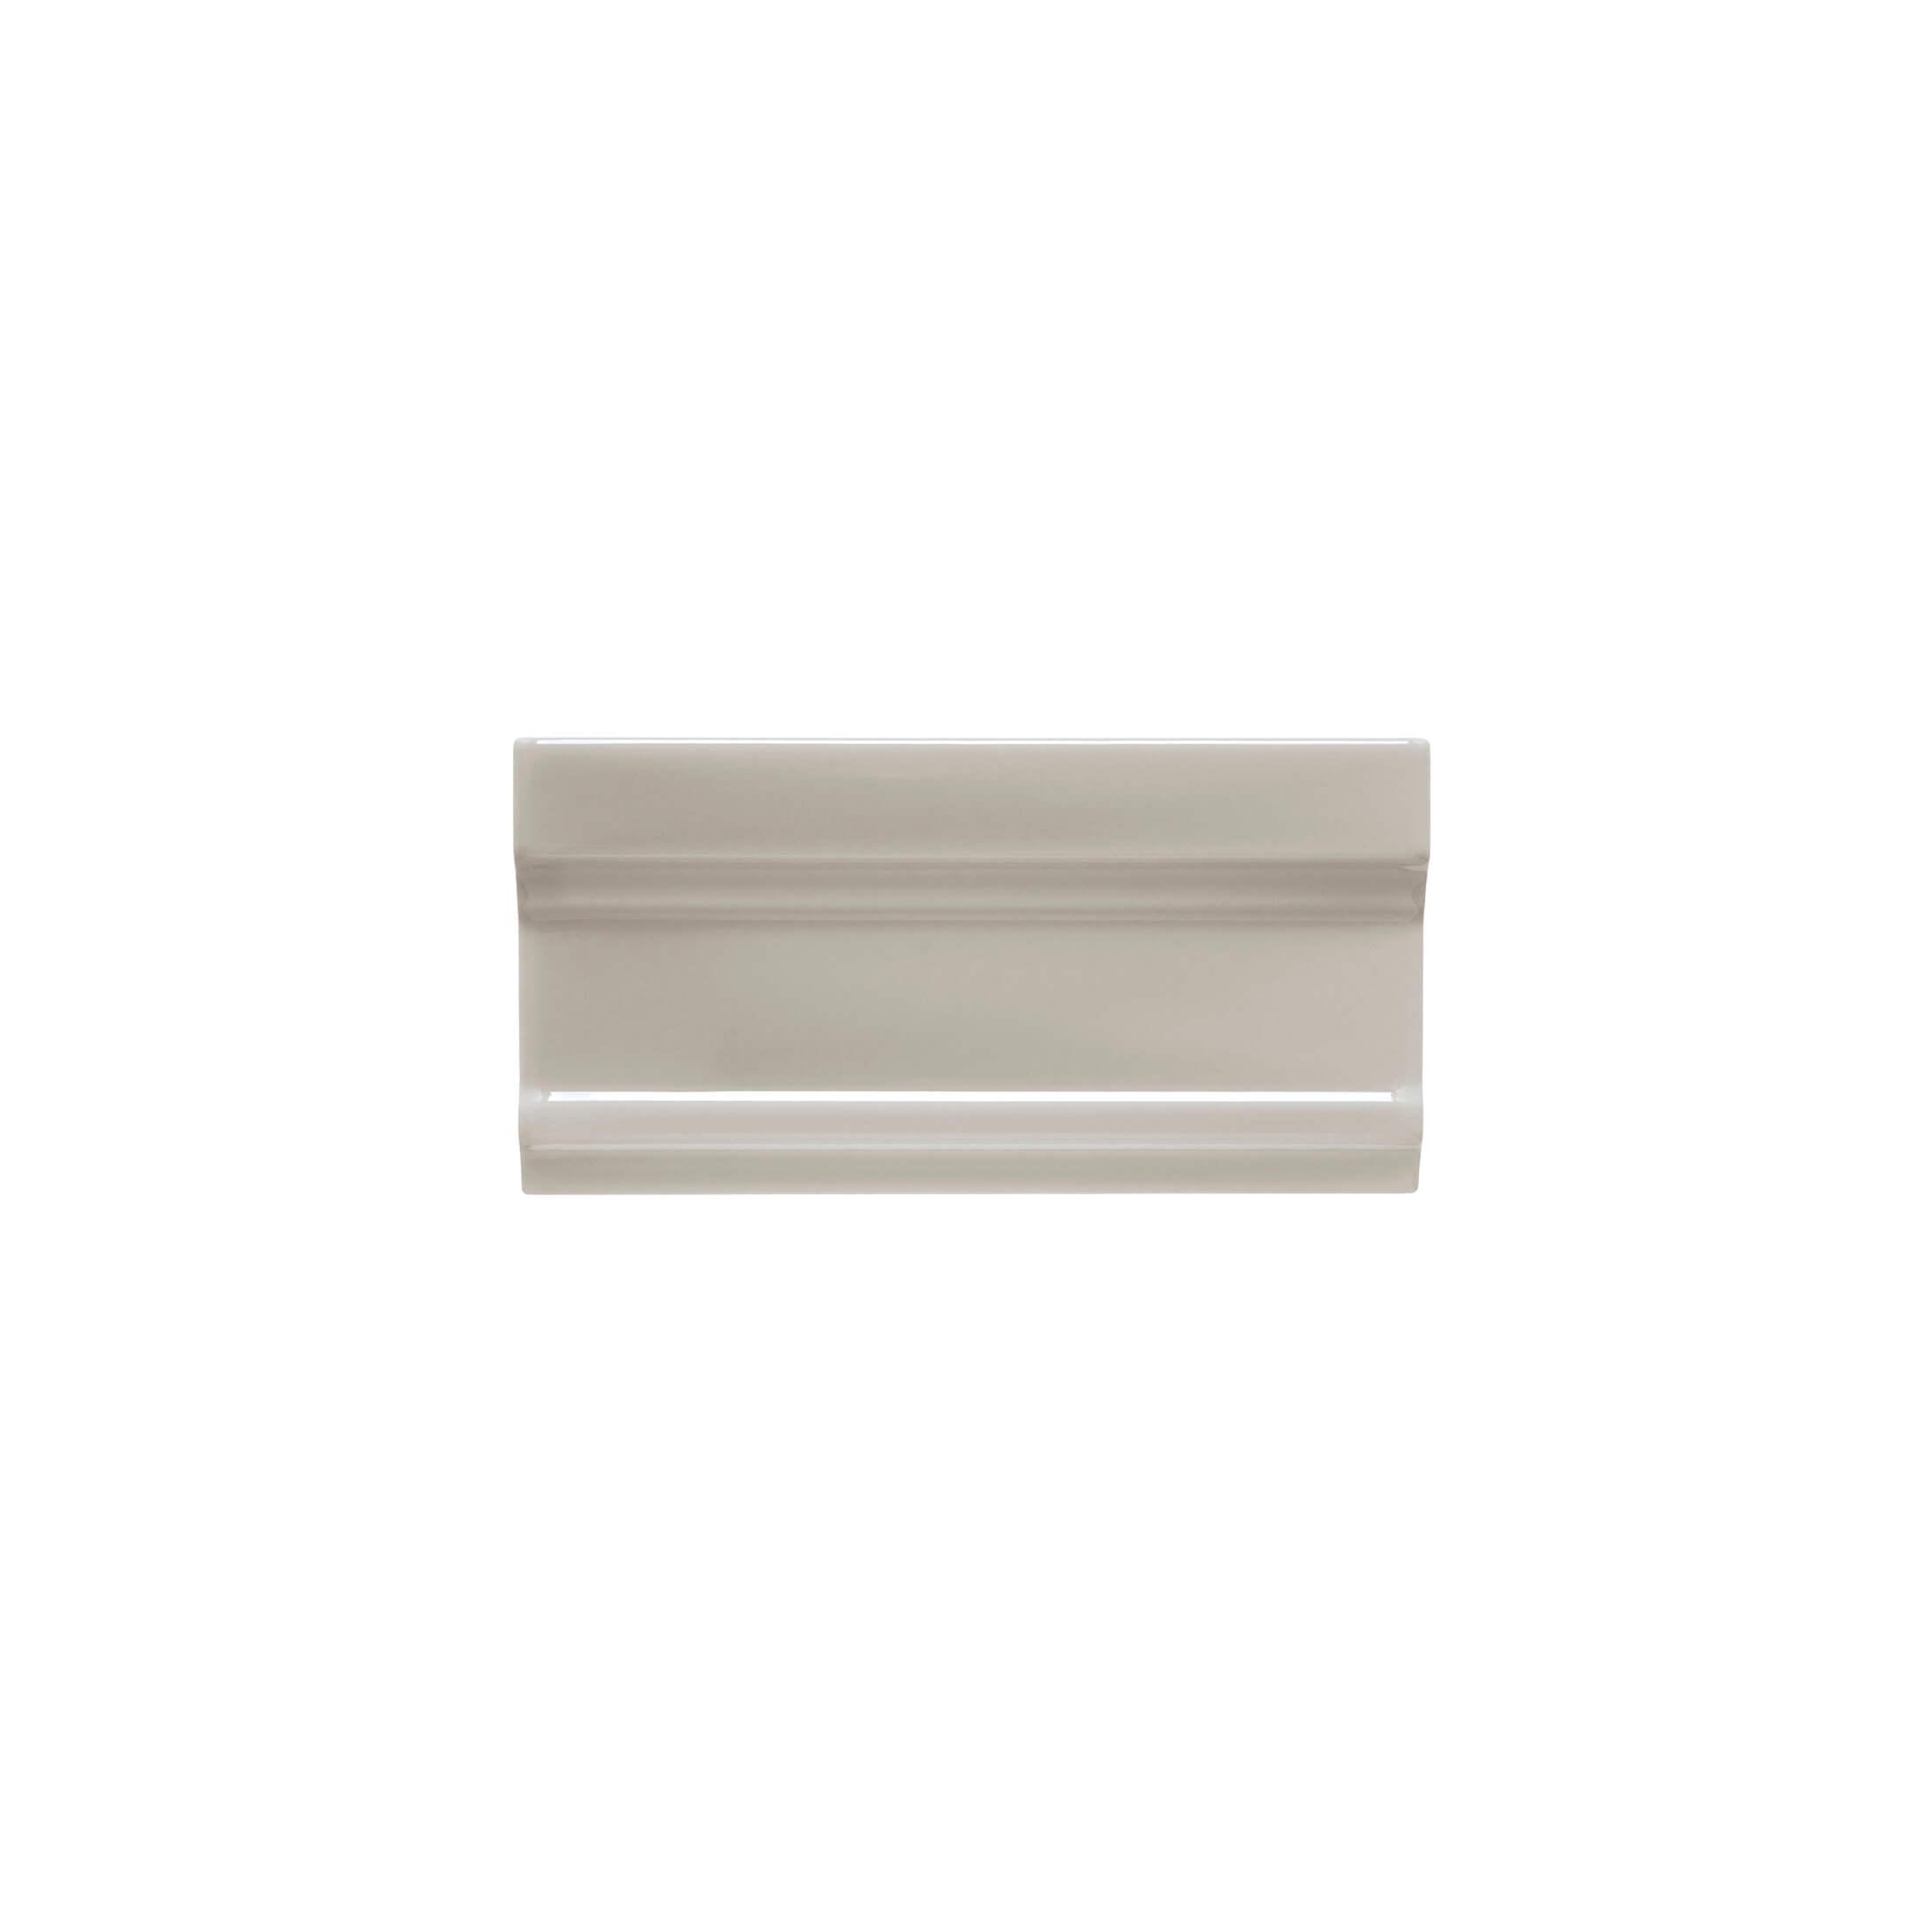 ADNE5511 - CORNISA CLASICA - 7.5 cm X 15 cm